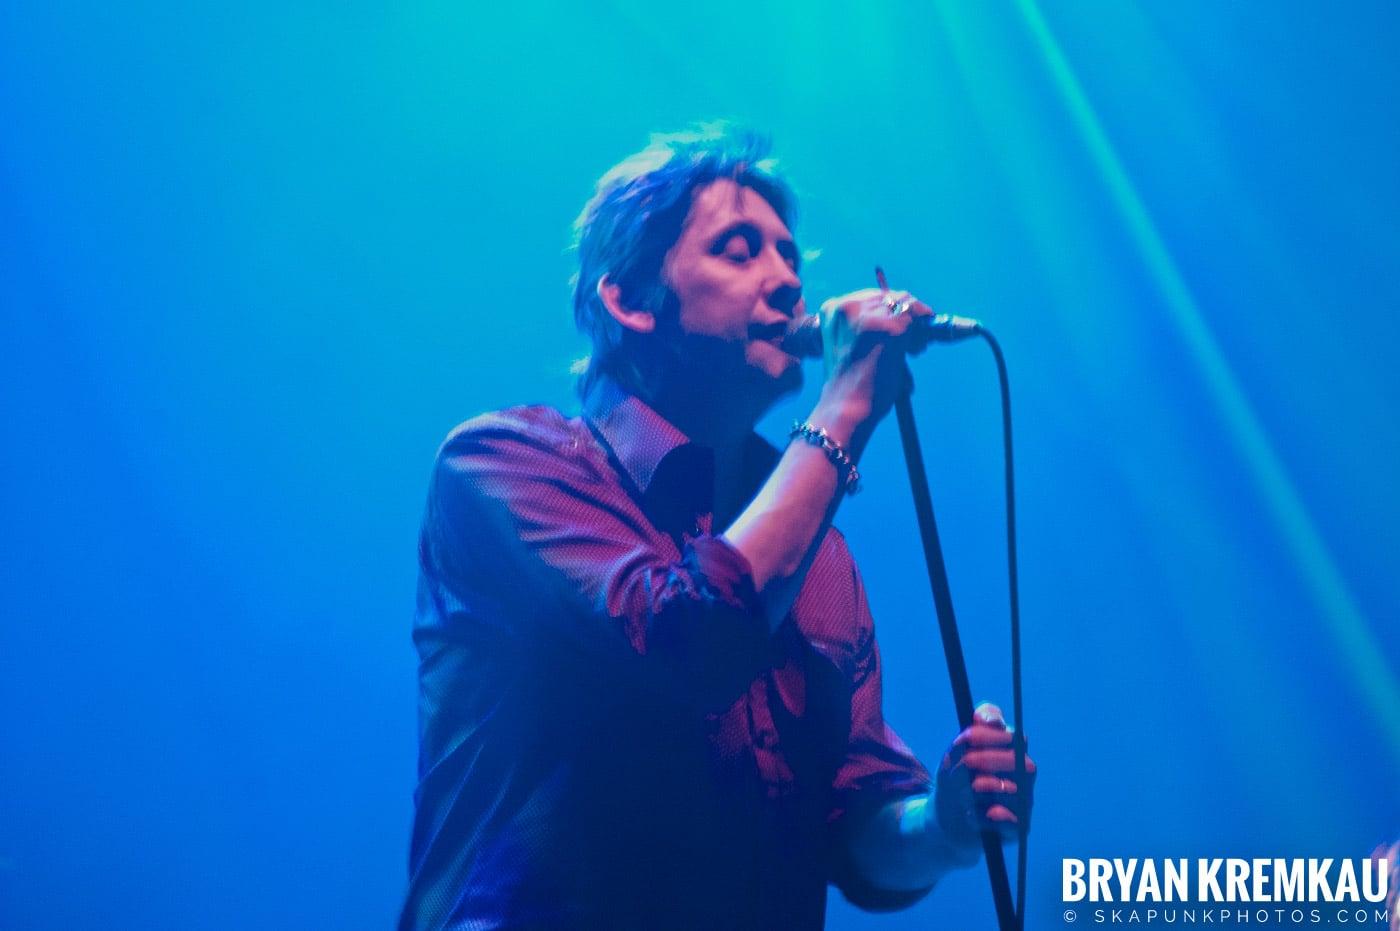 The Pogues @ Brixton Academy, London UK - 12.17.06 (15)